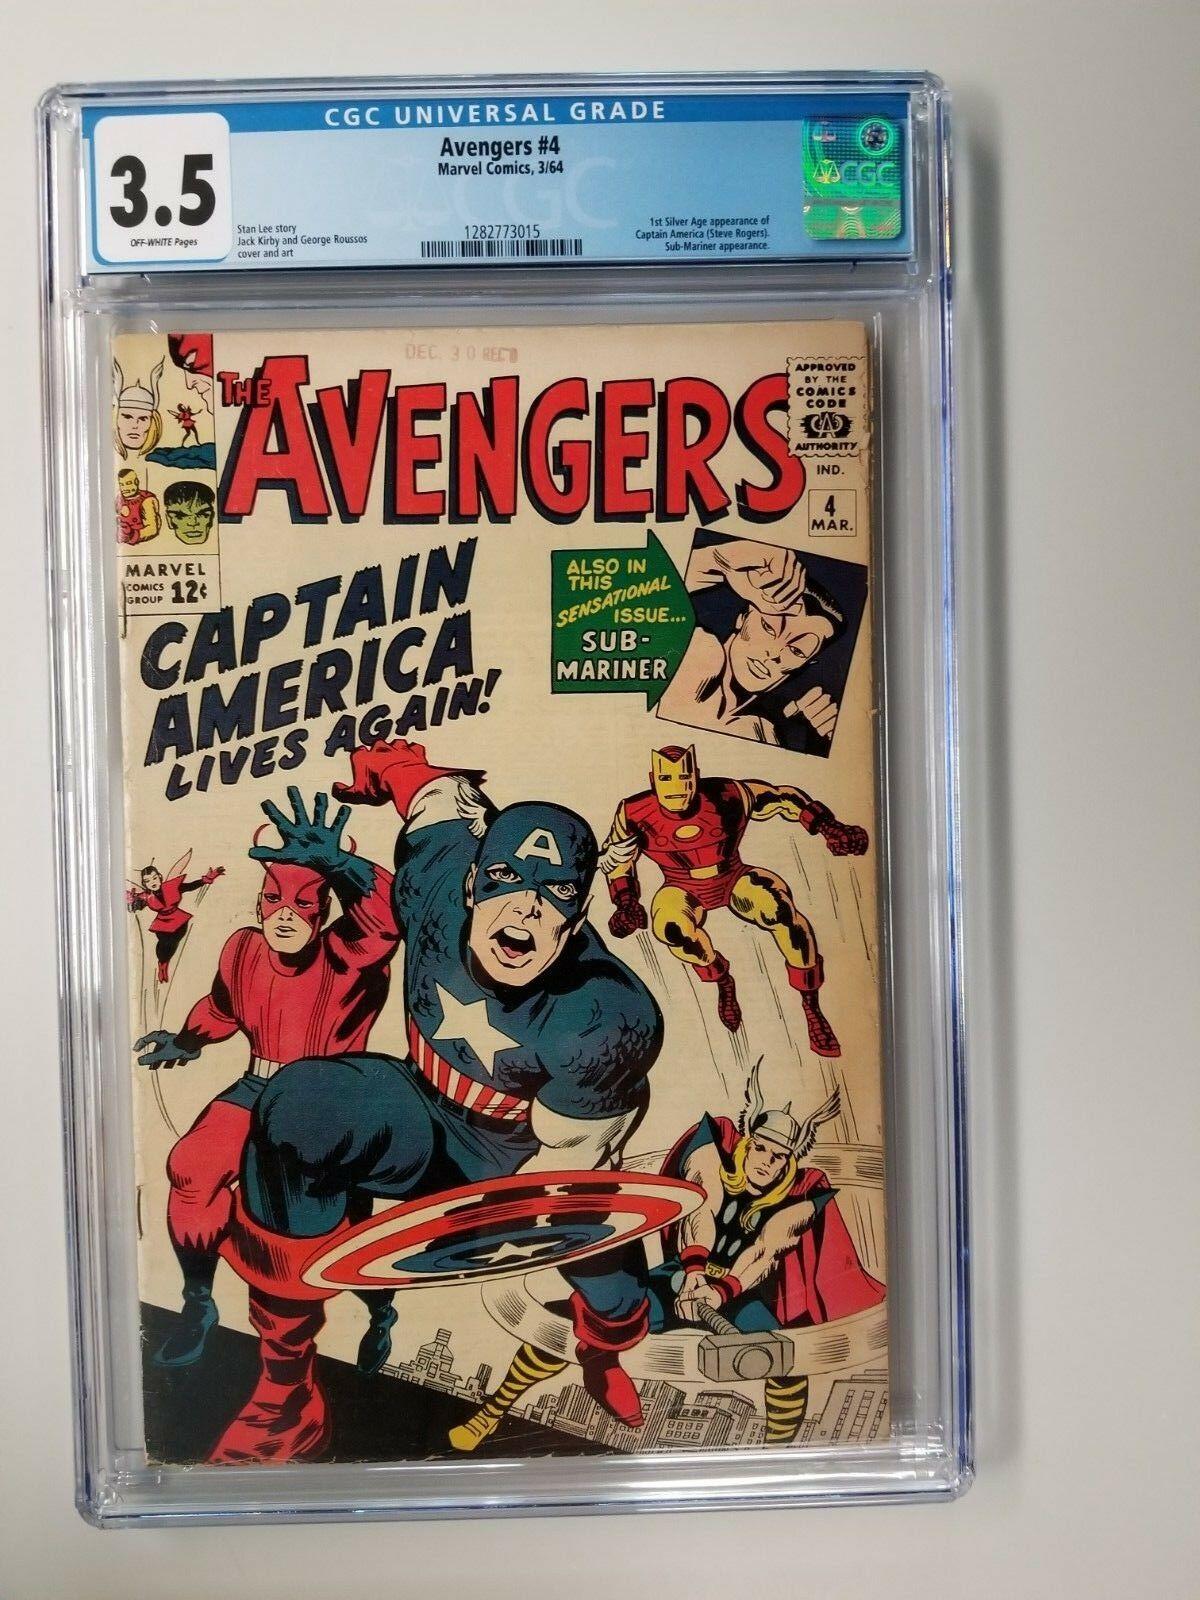 Avengers #4 CGC 3.5 VG- 1st Silver Age App Captain America 1964 - New Case